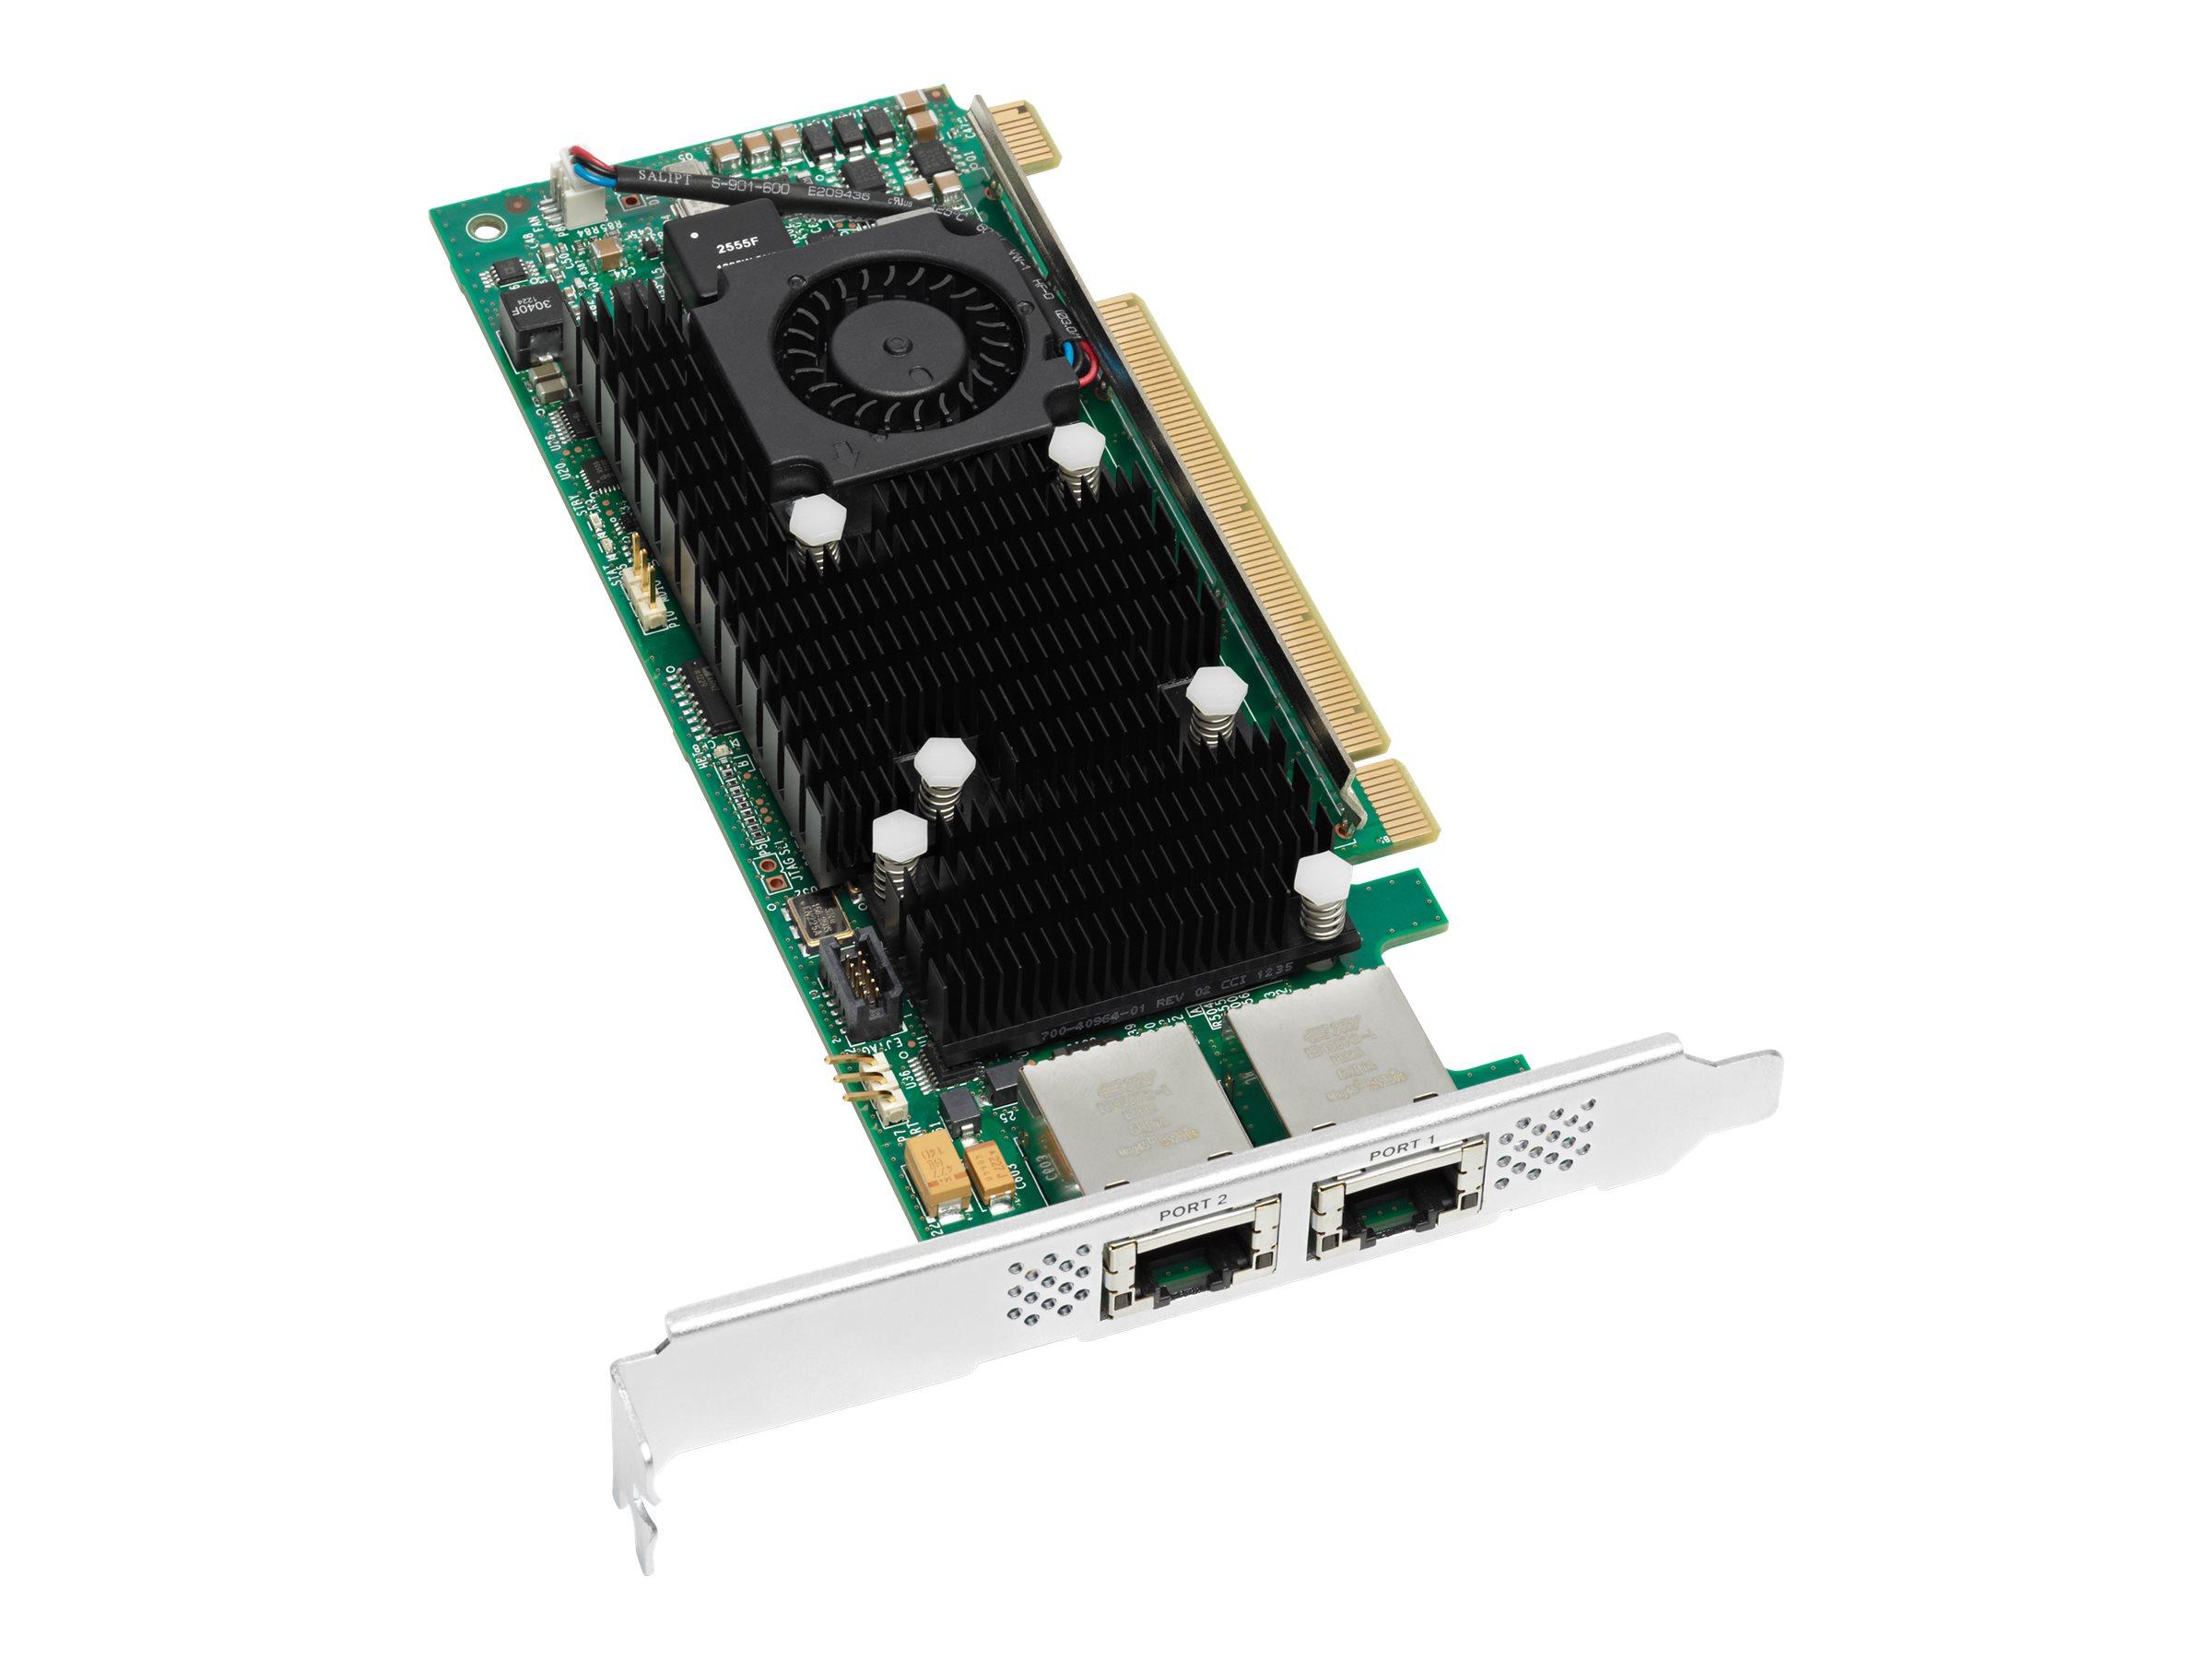 Cisco UCS Virtual Interface Card 1225 - Netzwerkadapter - PCIe 2.0 x16 - 10 GigE, 10Gb FCoE - für UCS C220 M4, SmartPlay Select